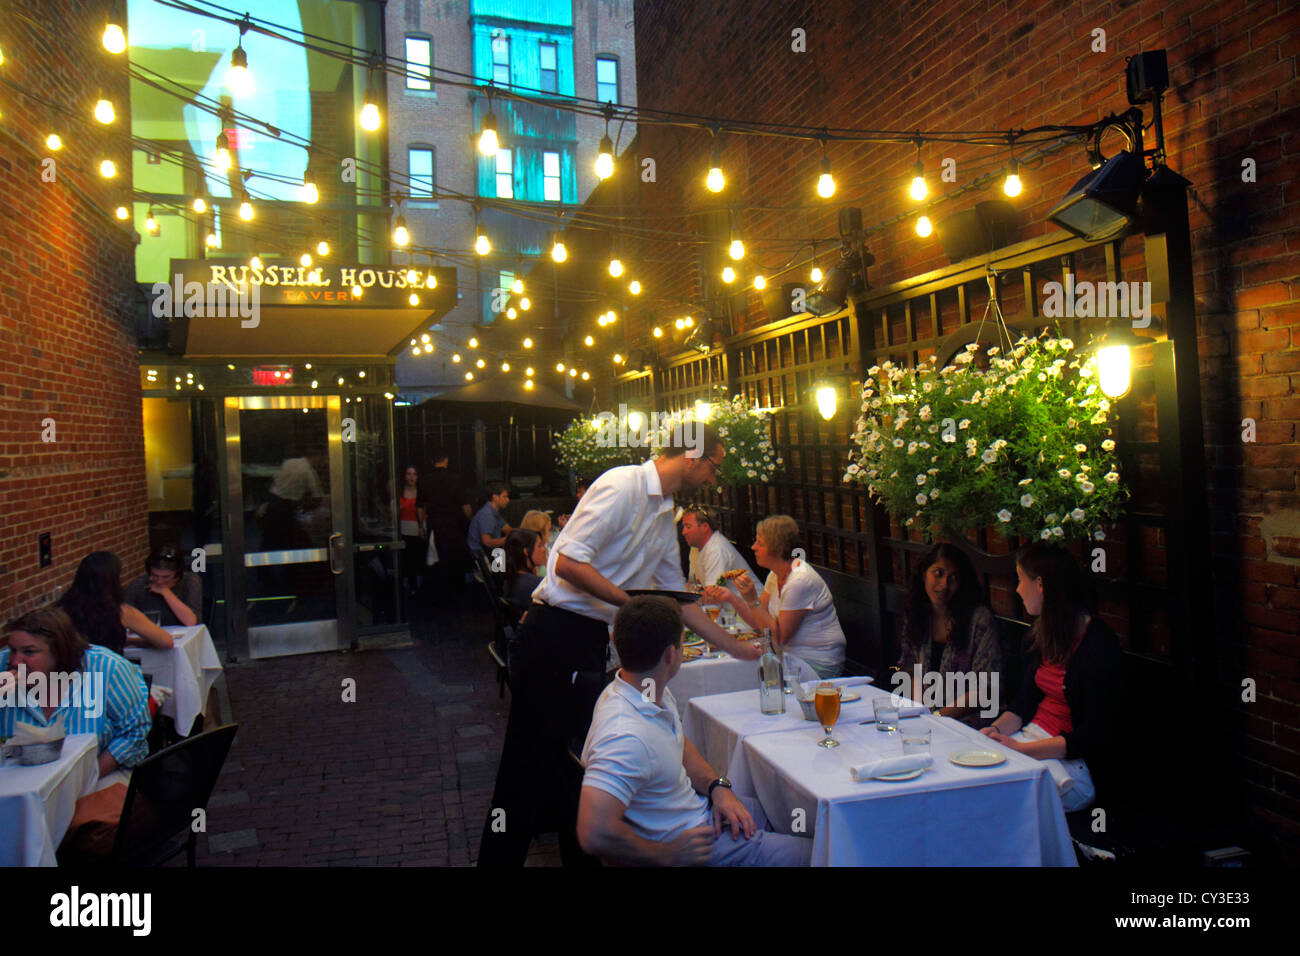 Boston Massachusetts Cambridge Harvard Square Russell House Tavern  Restaurant Alfresco Dining Waiter Tables Night Nightlife